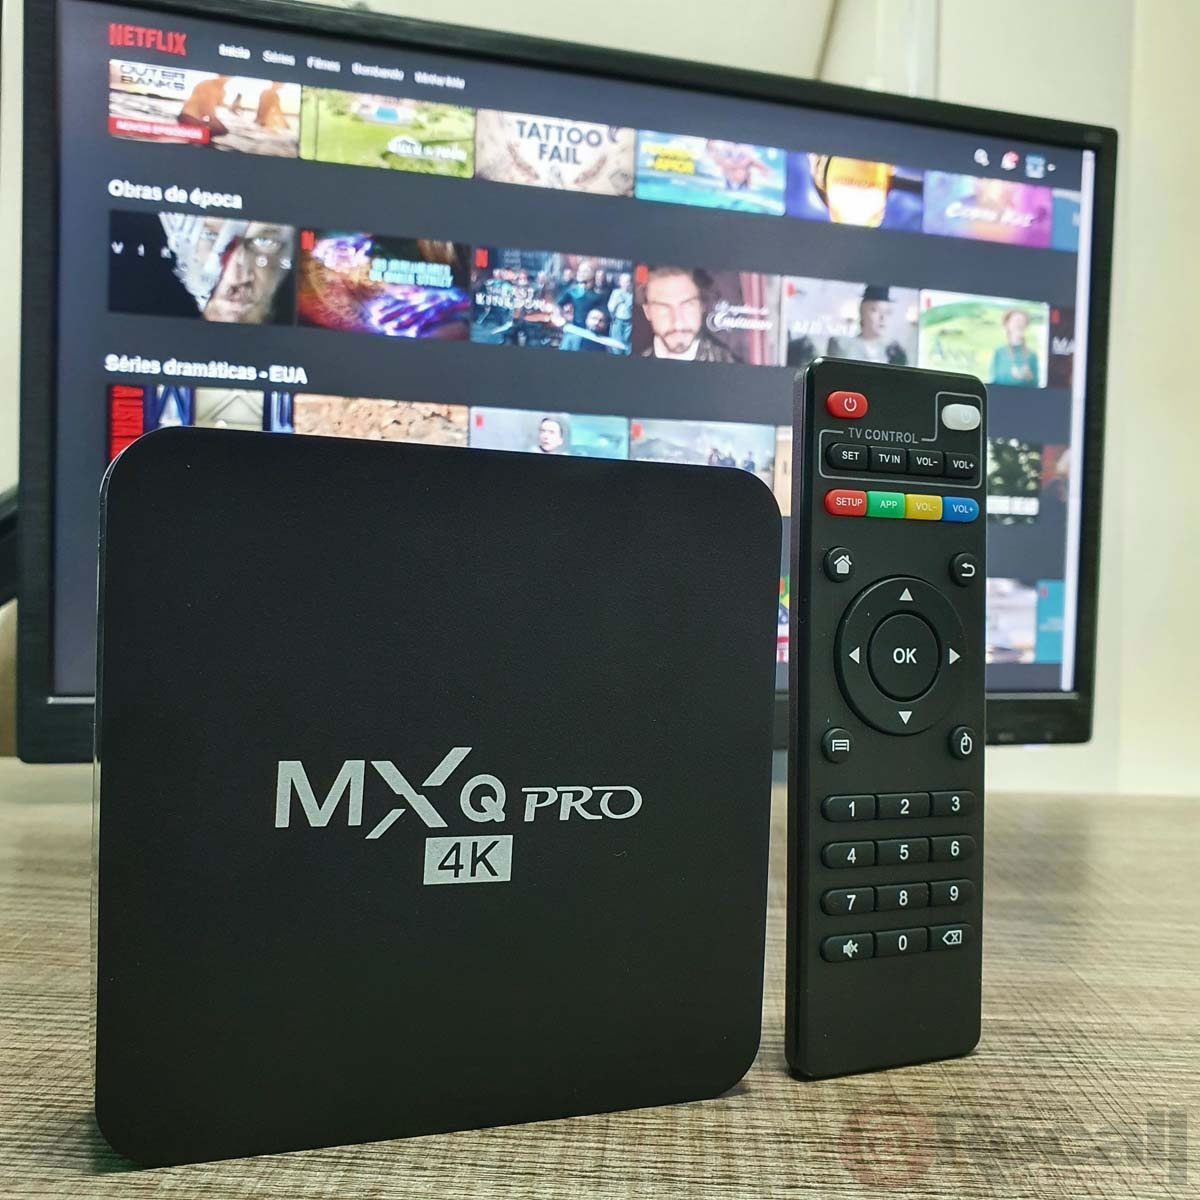 Tv Box 4k Android Smart 1080p 4K 16Gb RAM 256Gb Android 11.1 TVbox para TV Smart